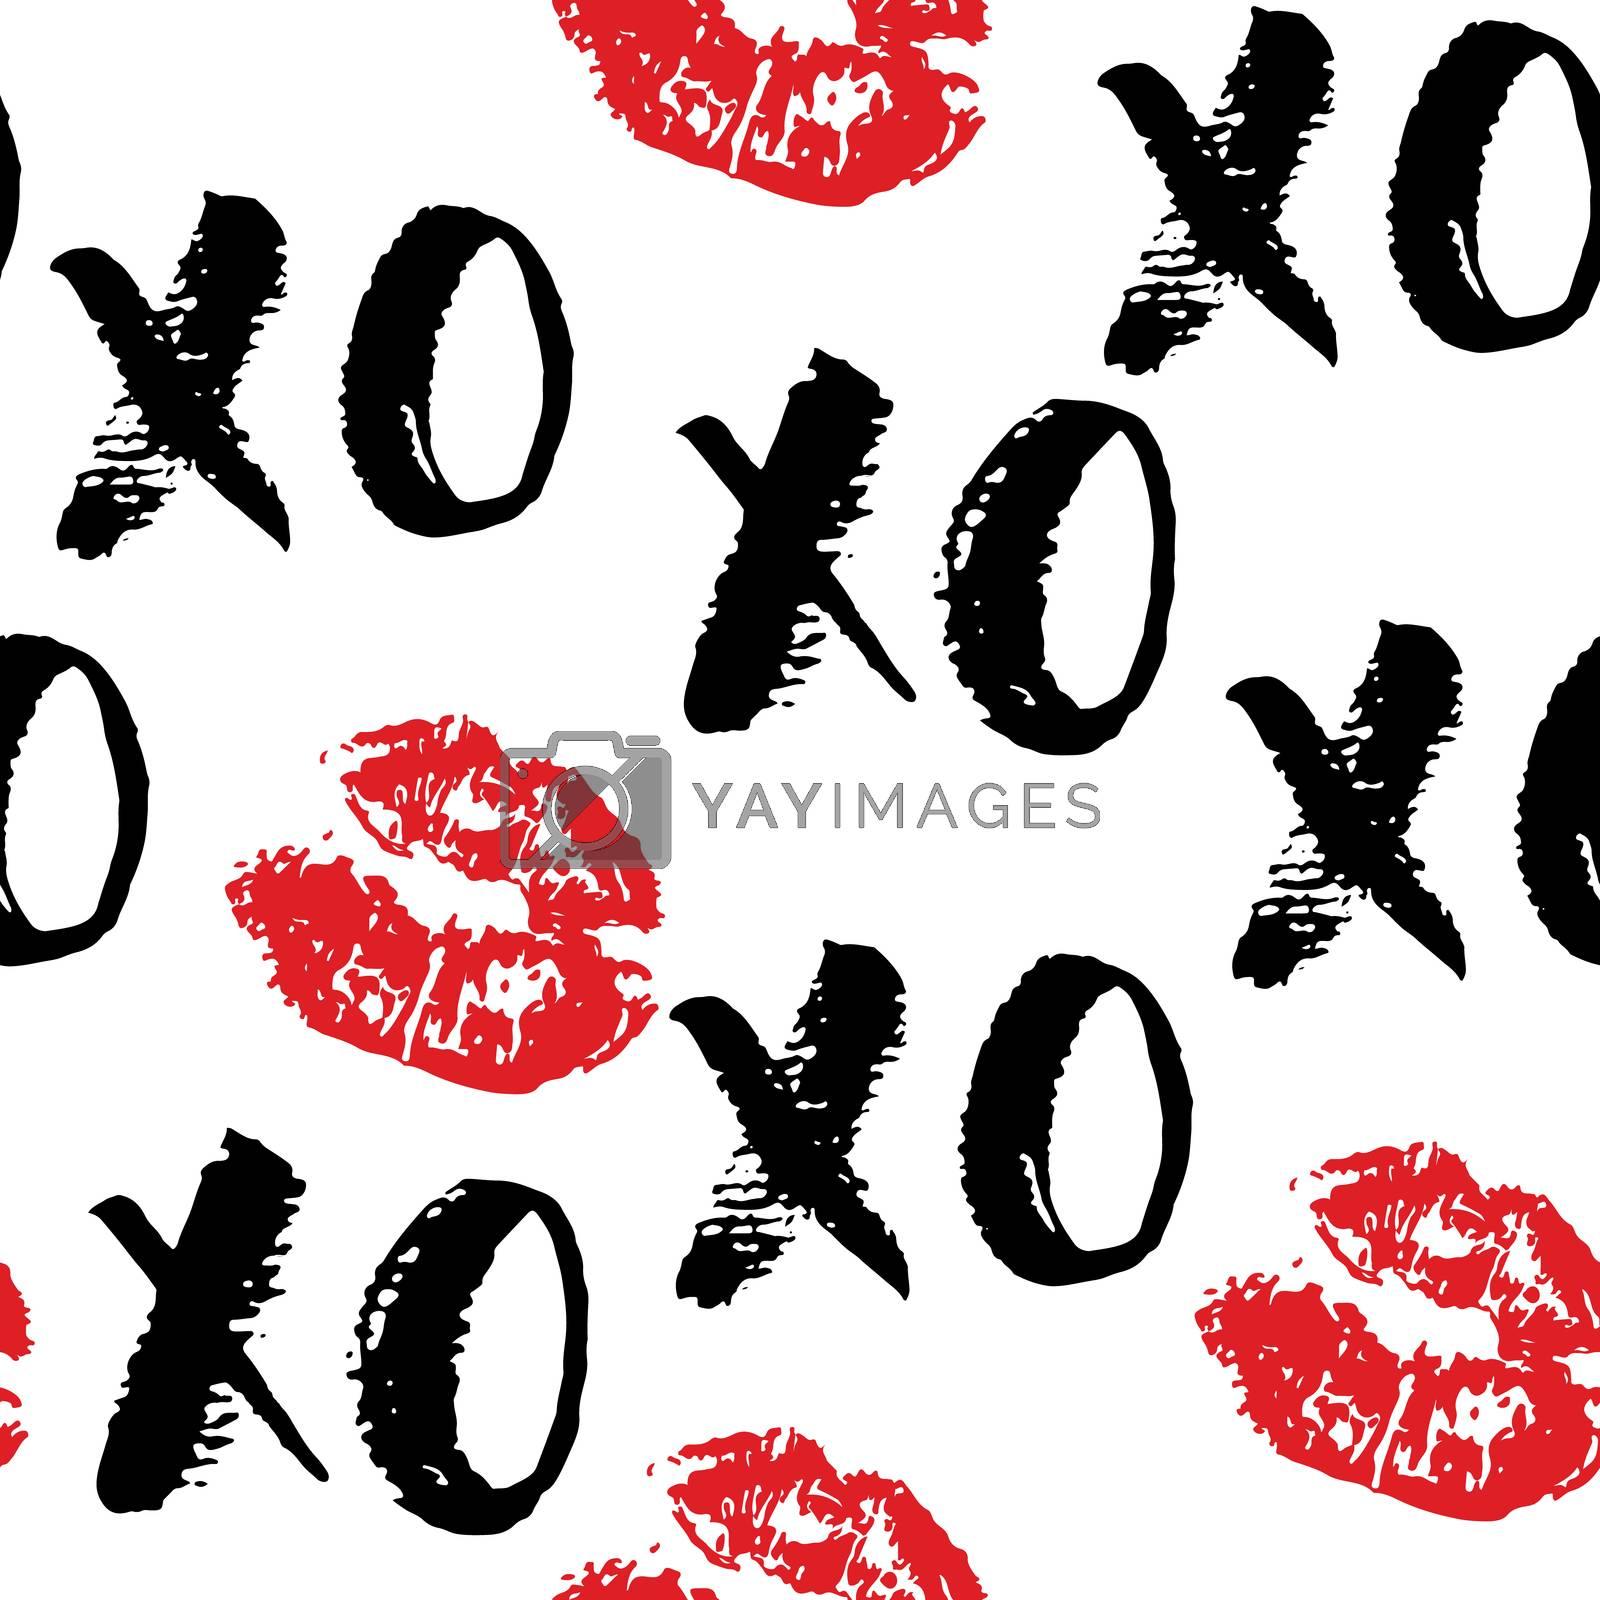 XOXO brush lettering signs seamless pattern, Grunge calligraphiv c hugs and kisses Phrase, Internet slang abbreviation XOXO symbols, vector illustration isolated on white background